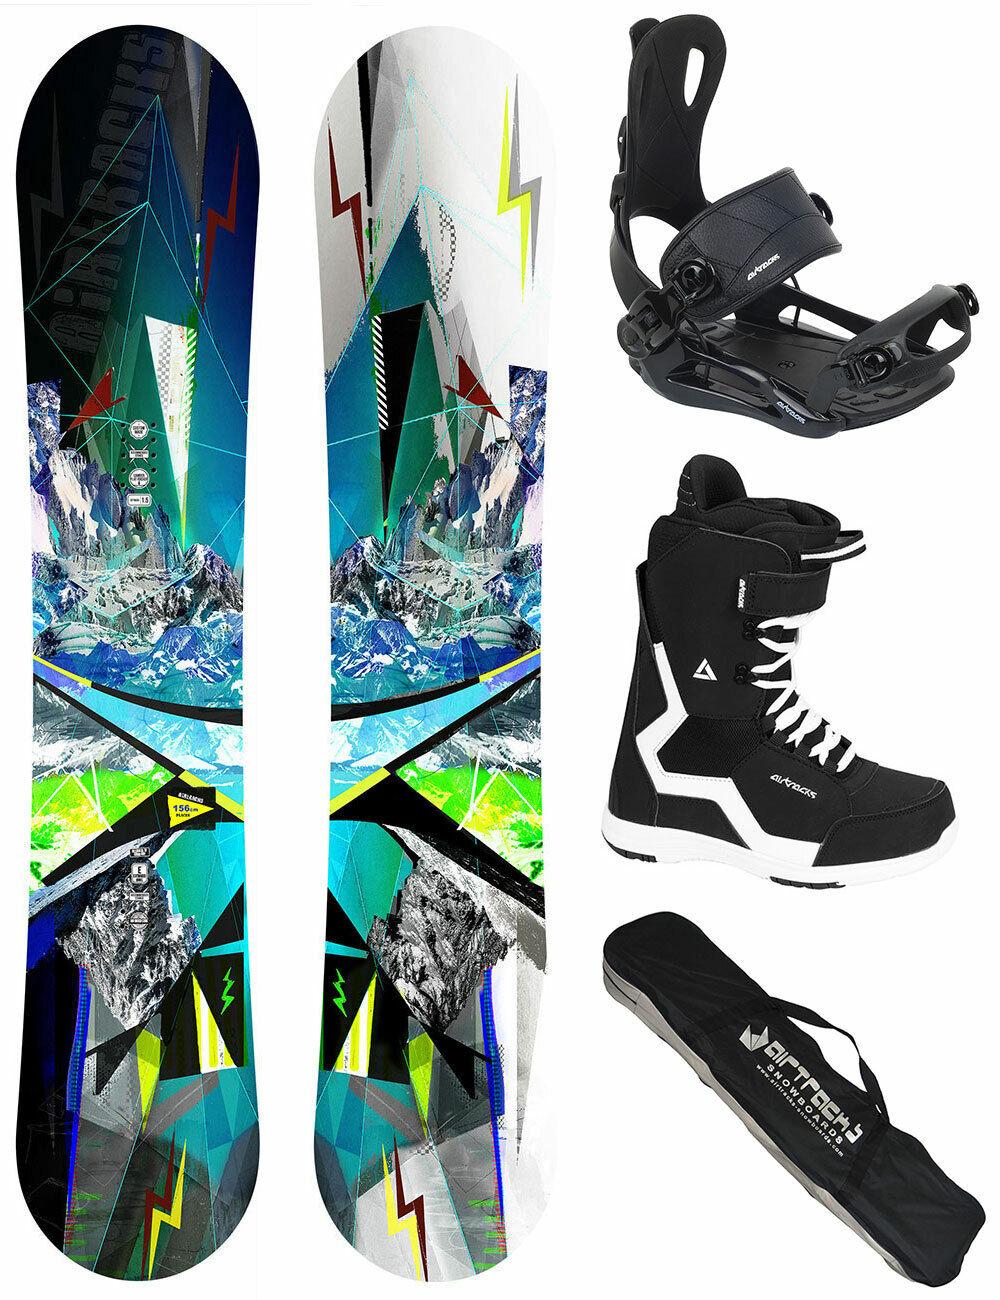 AIRTRACKS Snowboard Stel plaatsen Rocker Bindung Master laarzen Sb Zak 156 159 165